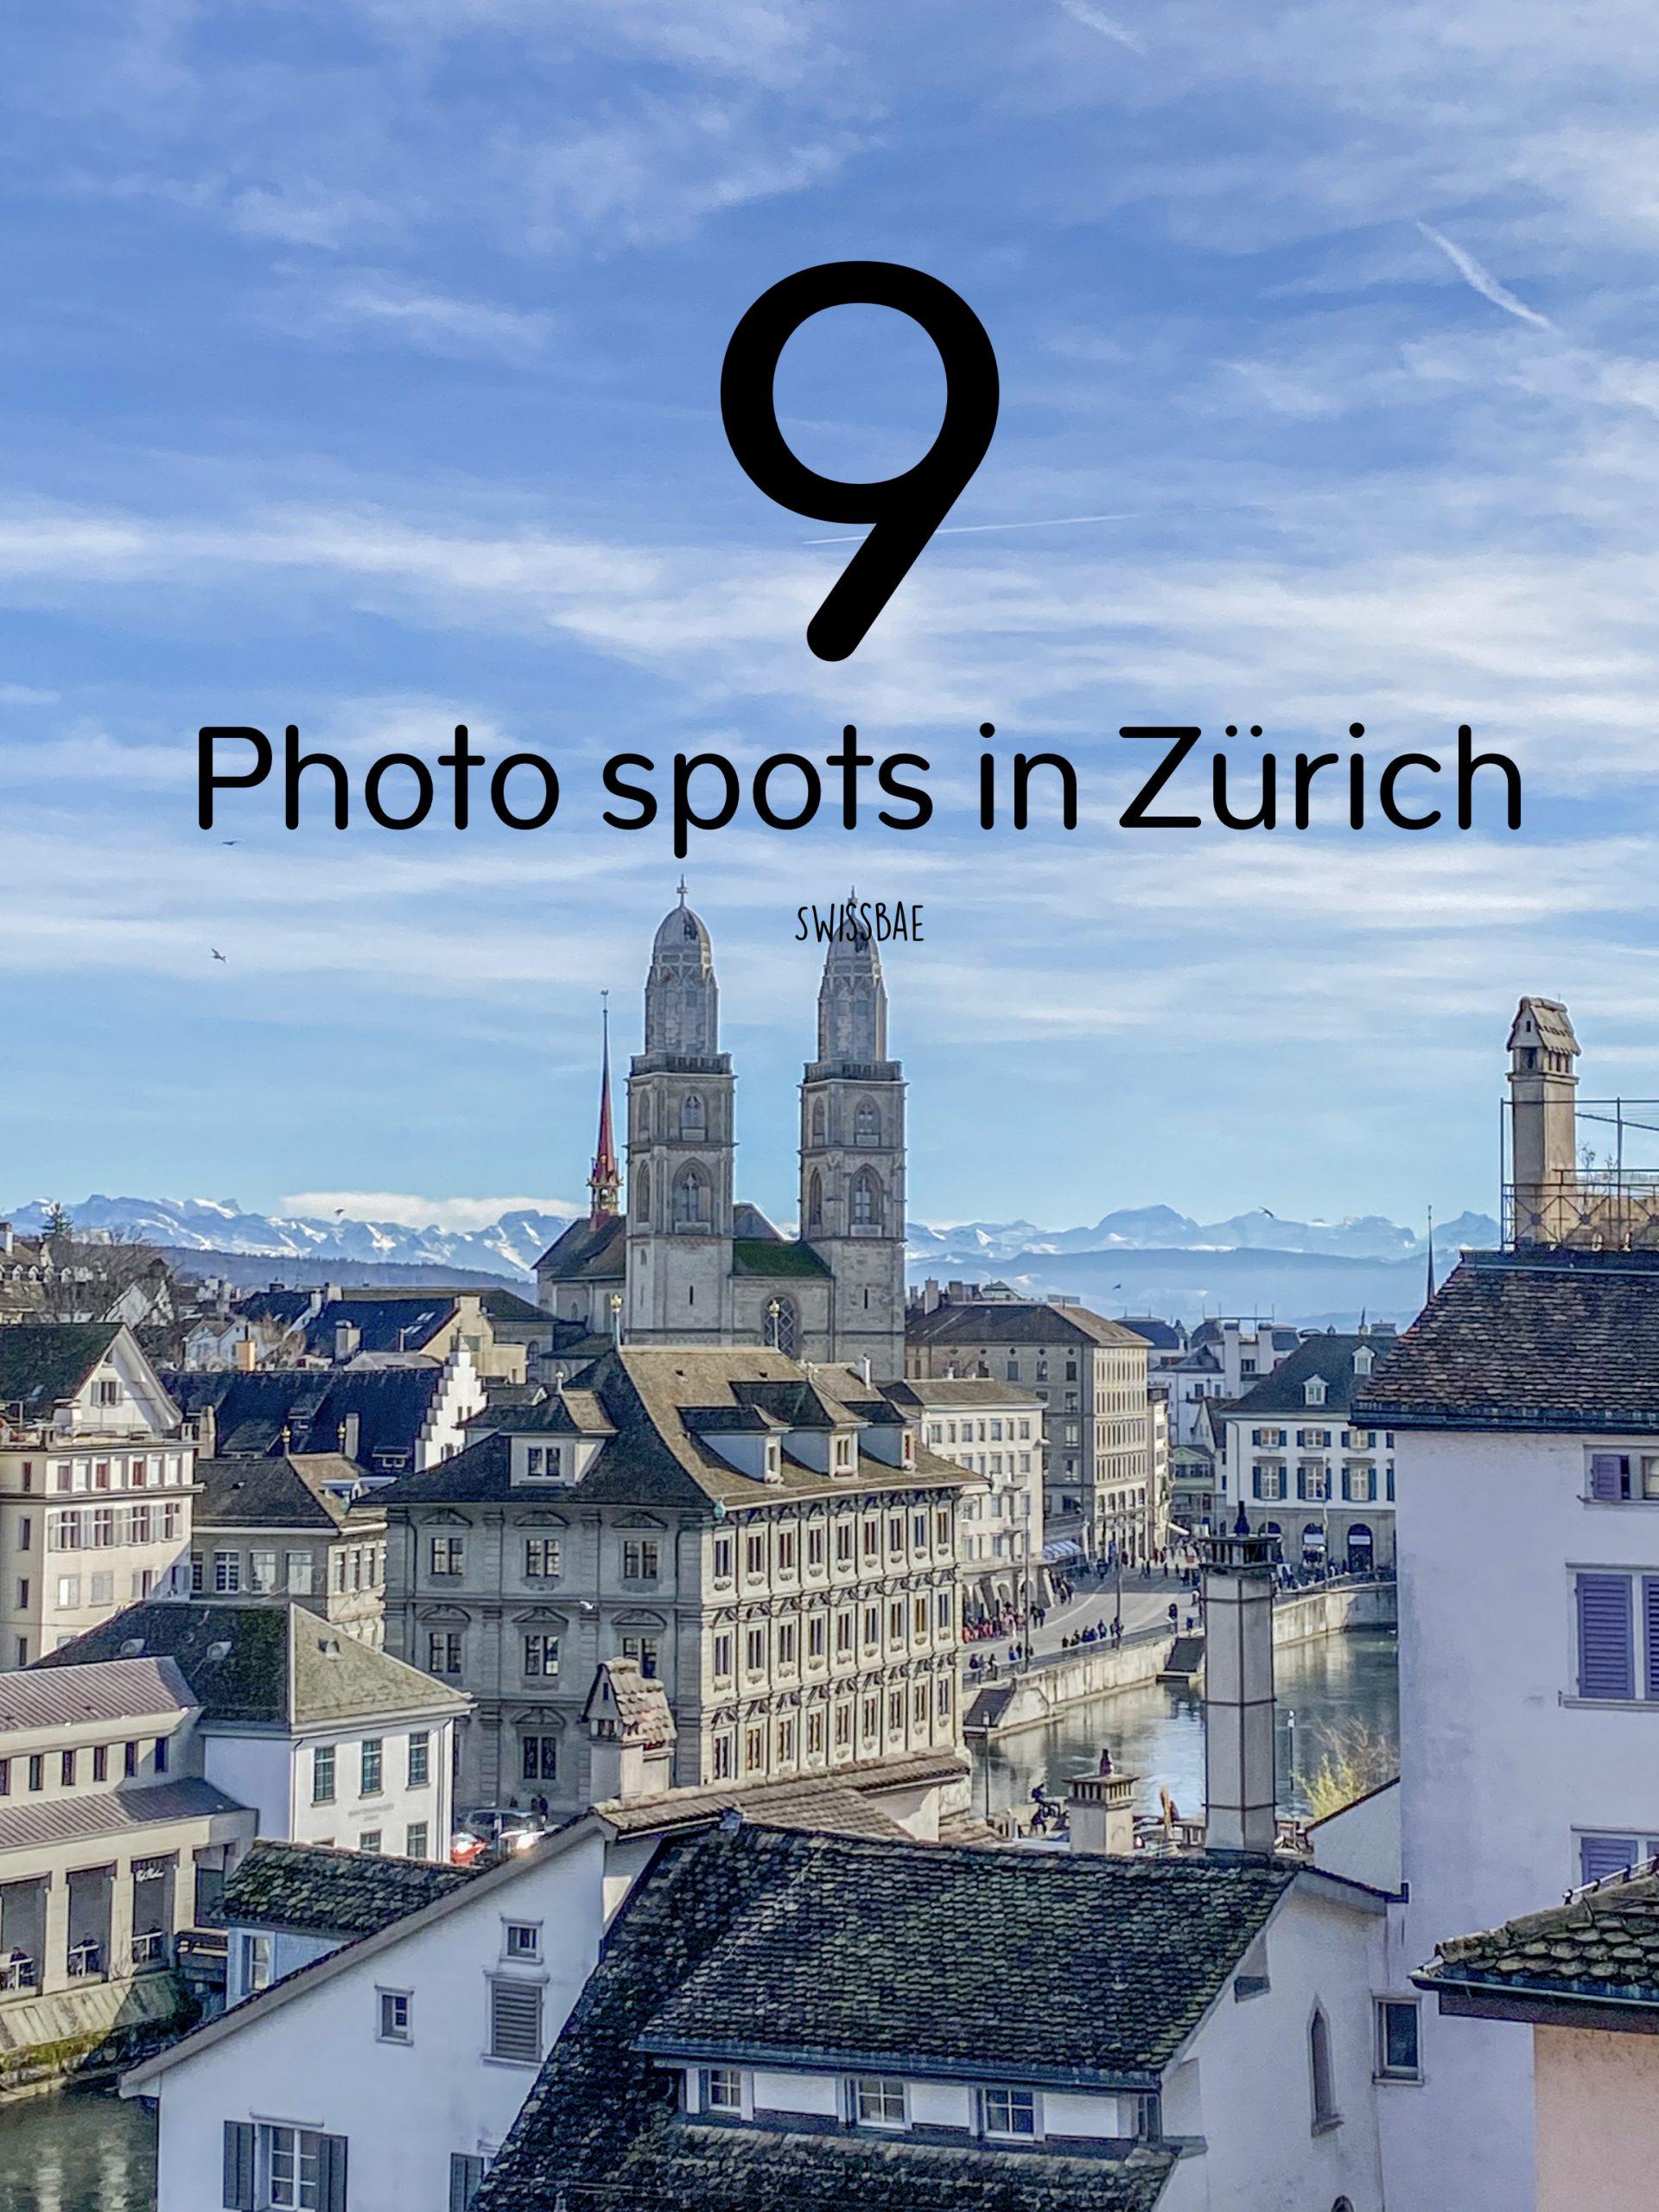 9 photo spots in Zürich city